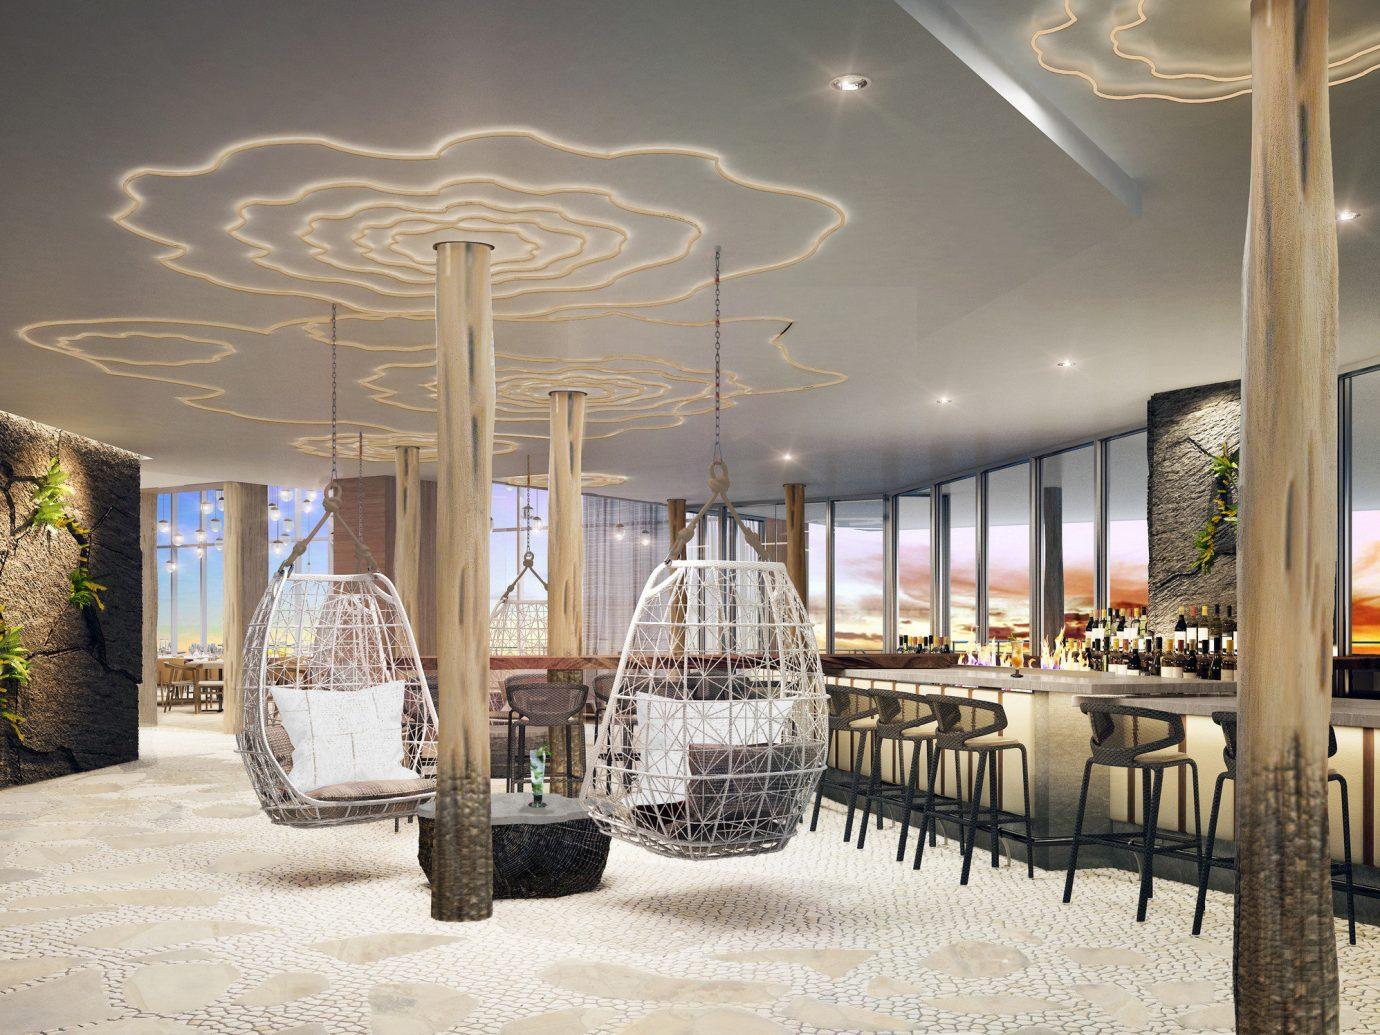 Hotels indoor estate restaurant lighting interior design aisle